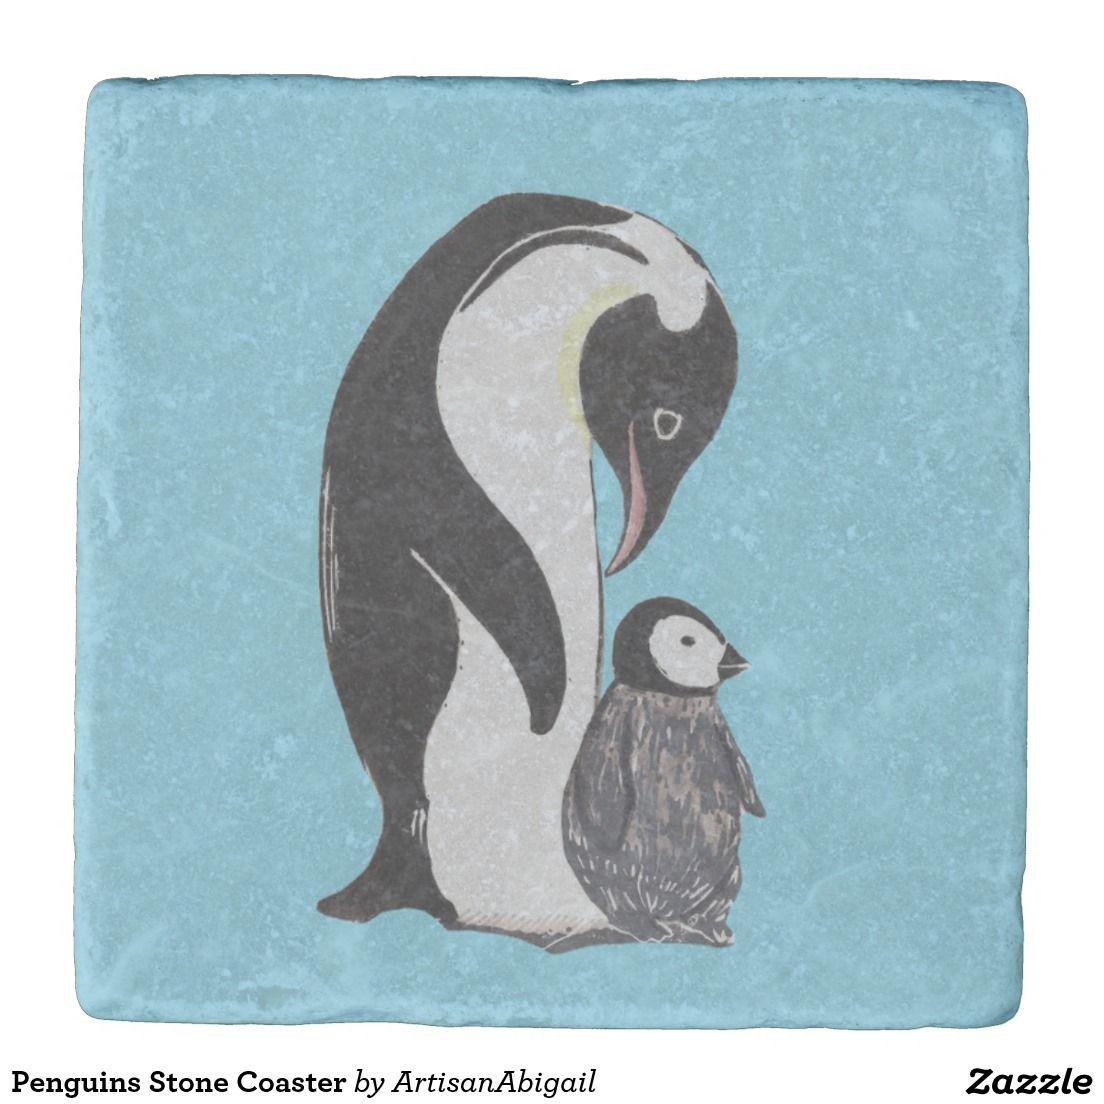 Sold! Thank you to the customers and enjoy! Penguins Stone Coaster; ArtisanAbigail at Zazzle; Abigail Davidson Art